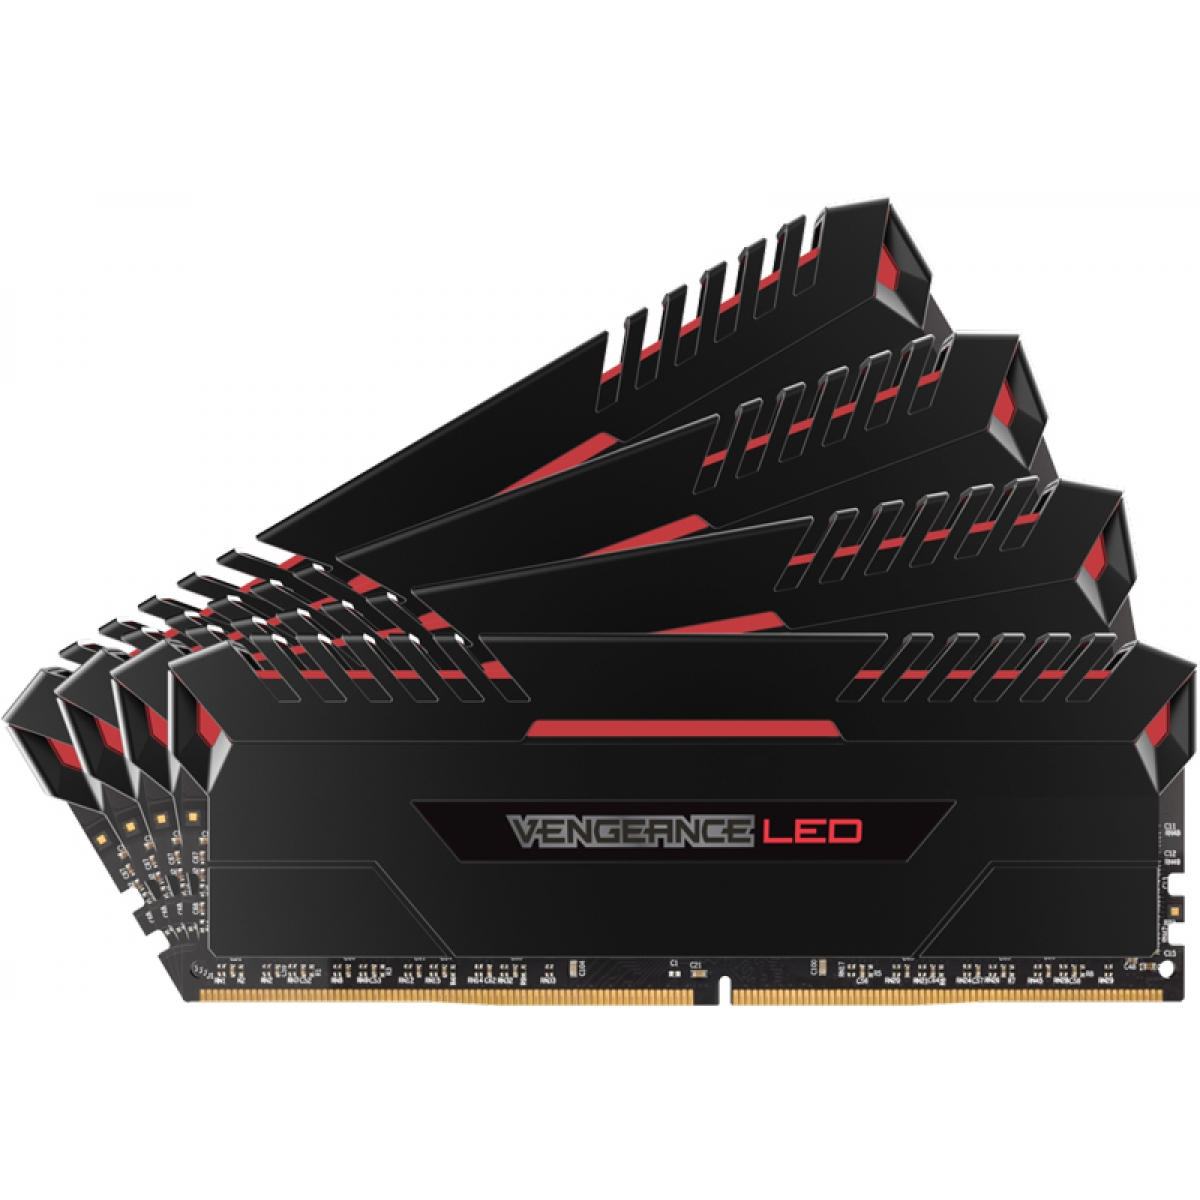 Memória DDR4 Corsair Vengeance LED 32GB (4x8GB) 3000MHz CMU32GX4M4C3000C15R